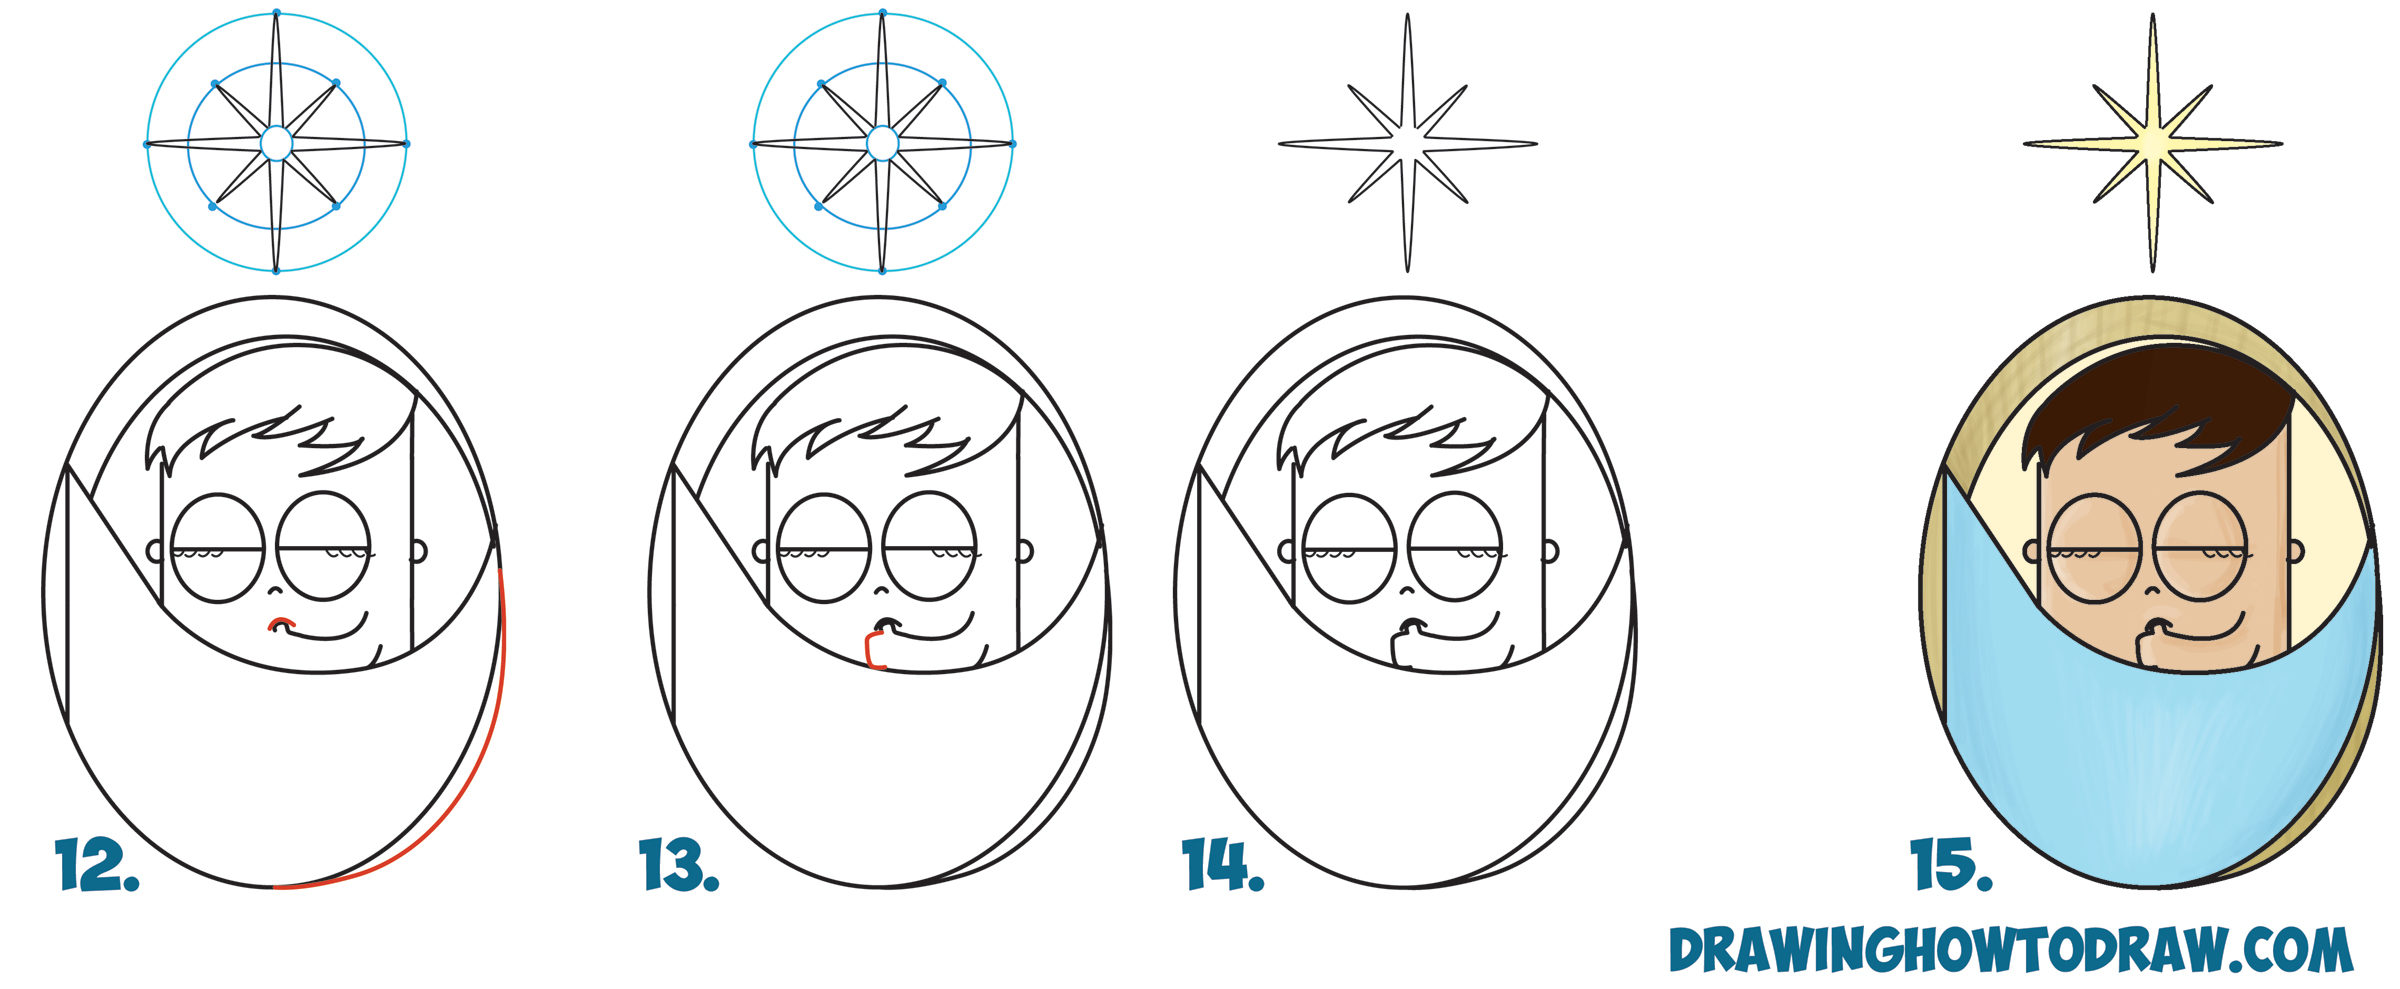 how to draw cute cartoon baby jesus sleeping under the north star